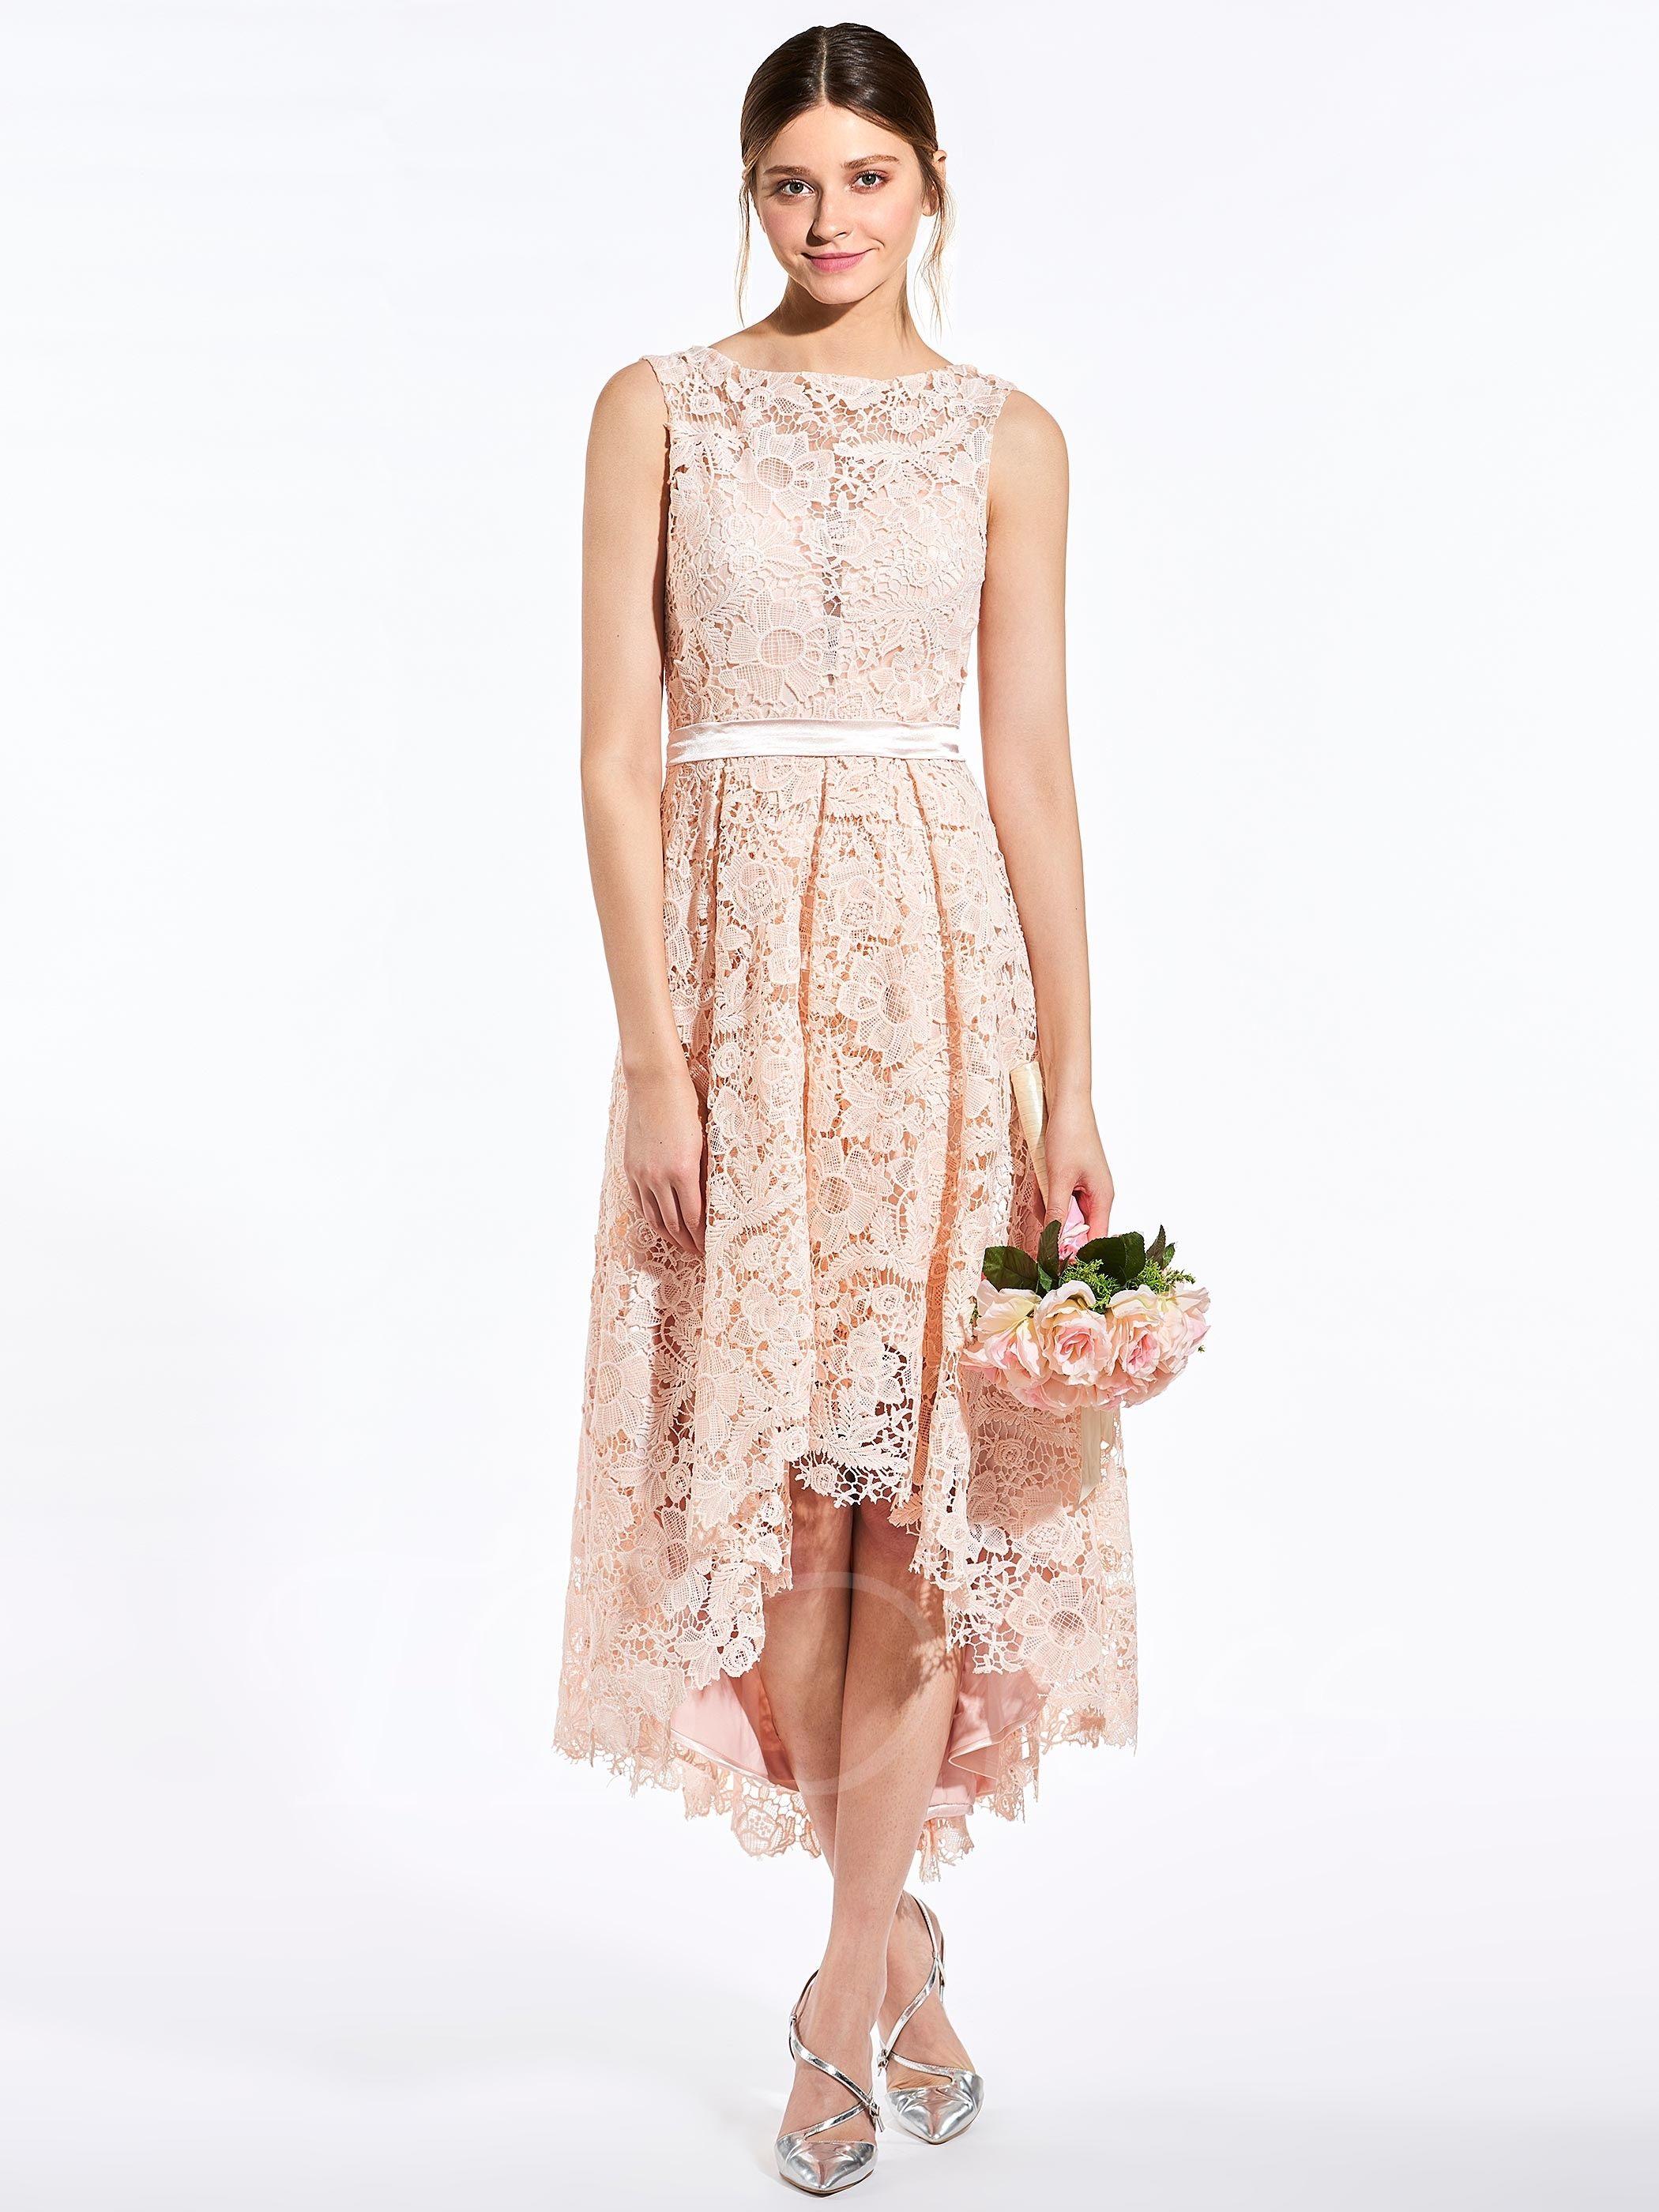 Halter top wedding dresses plus size  Lace Button HighLow Bridesmaid Dress  High low bridesmaid dresses